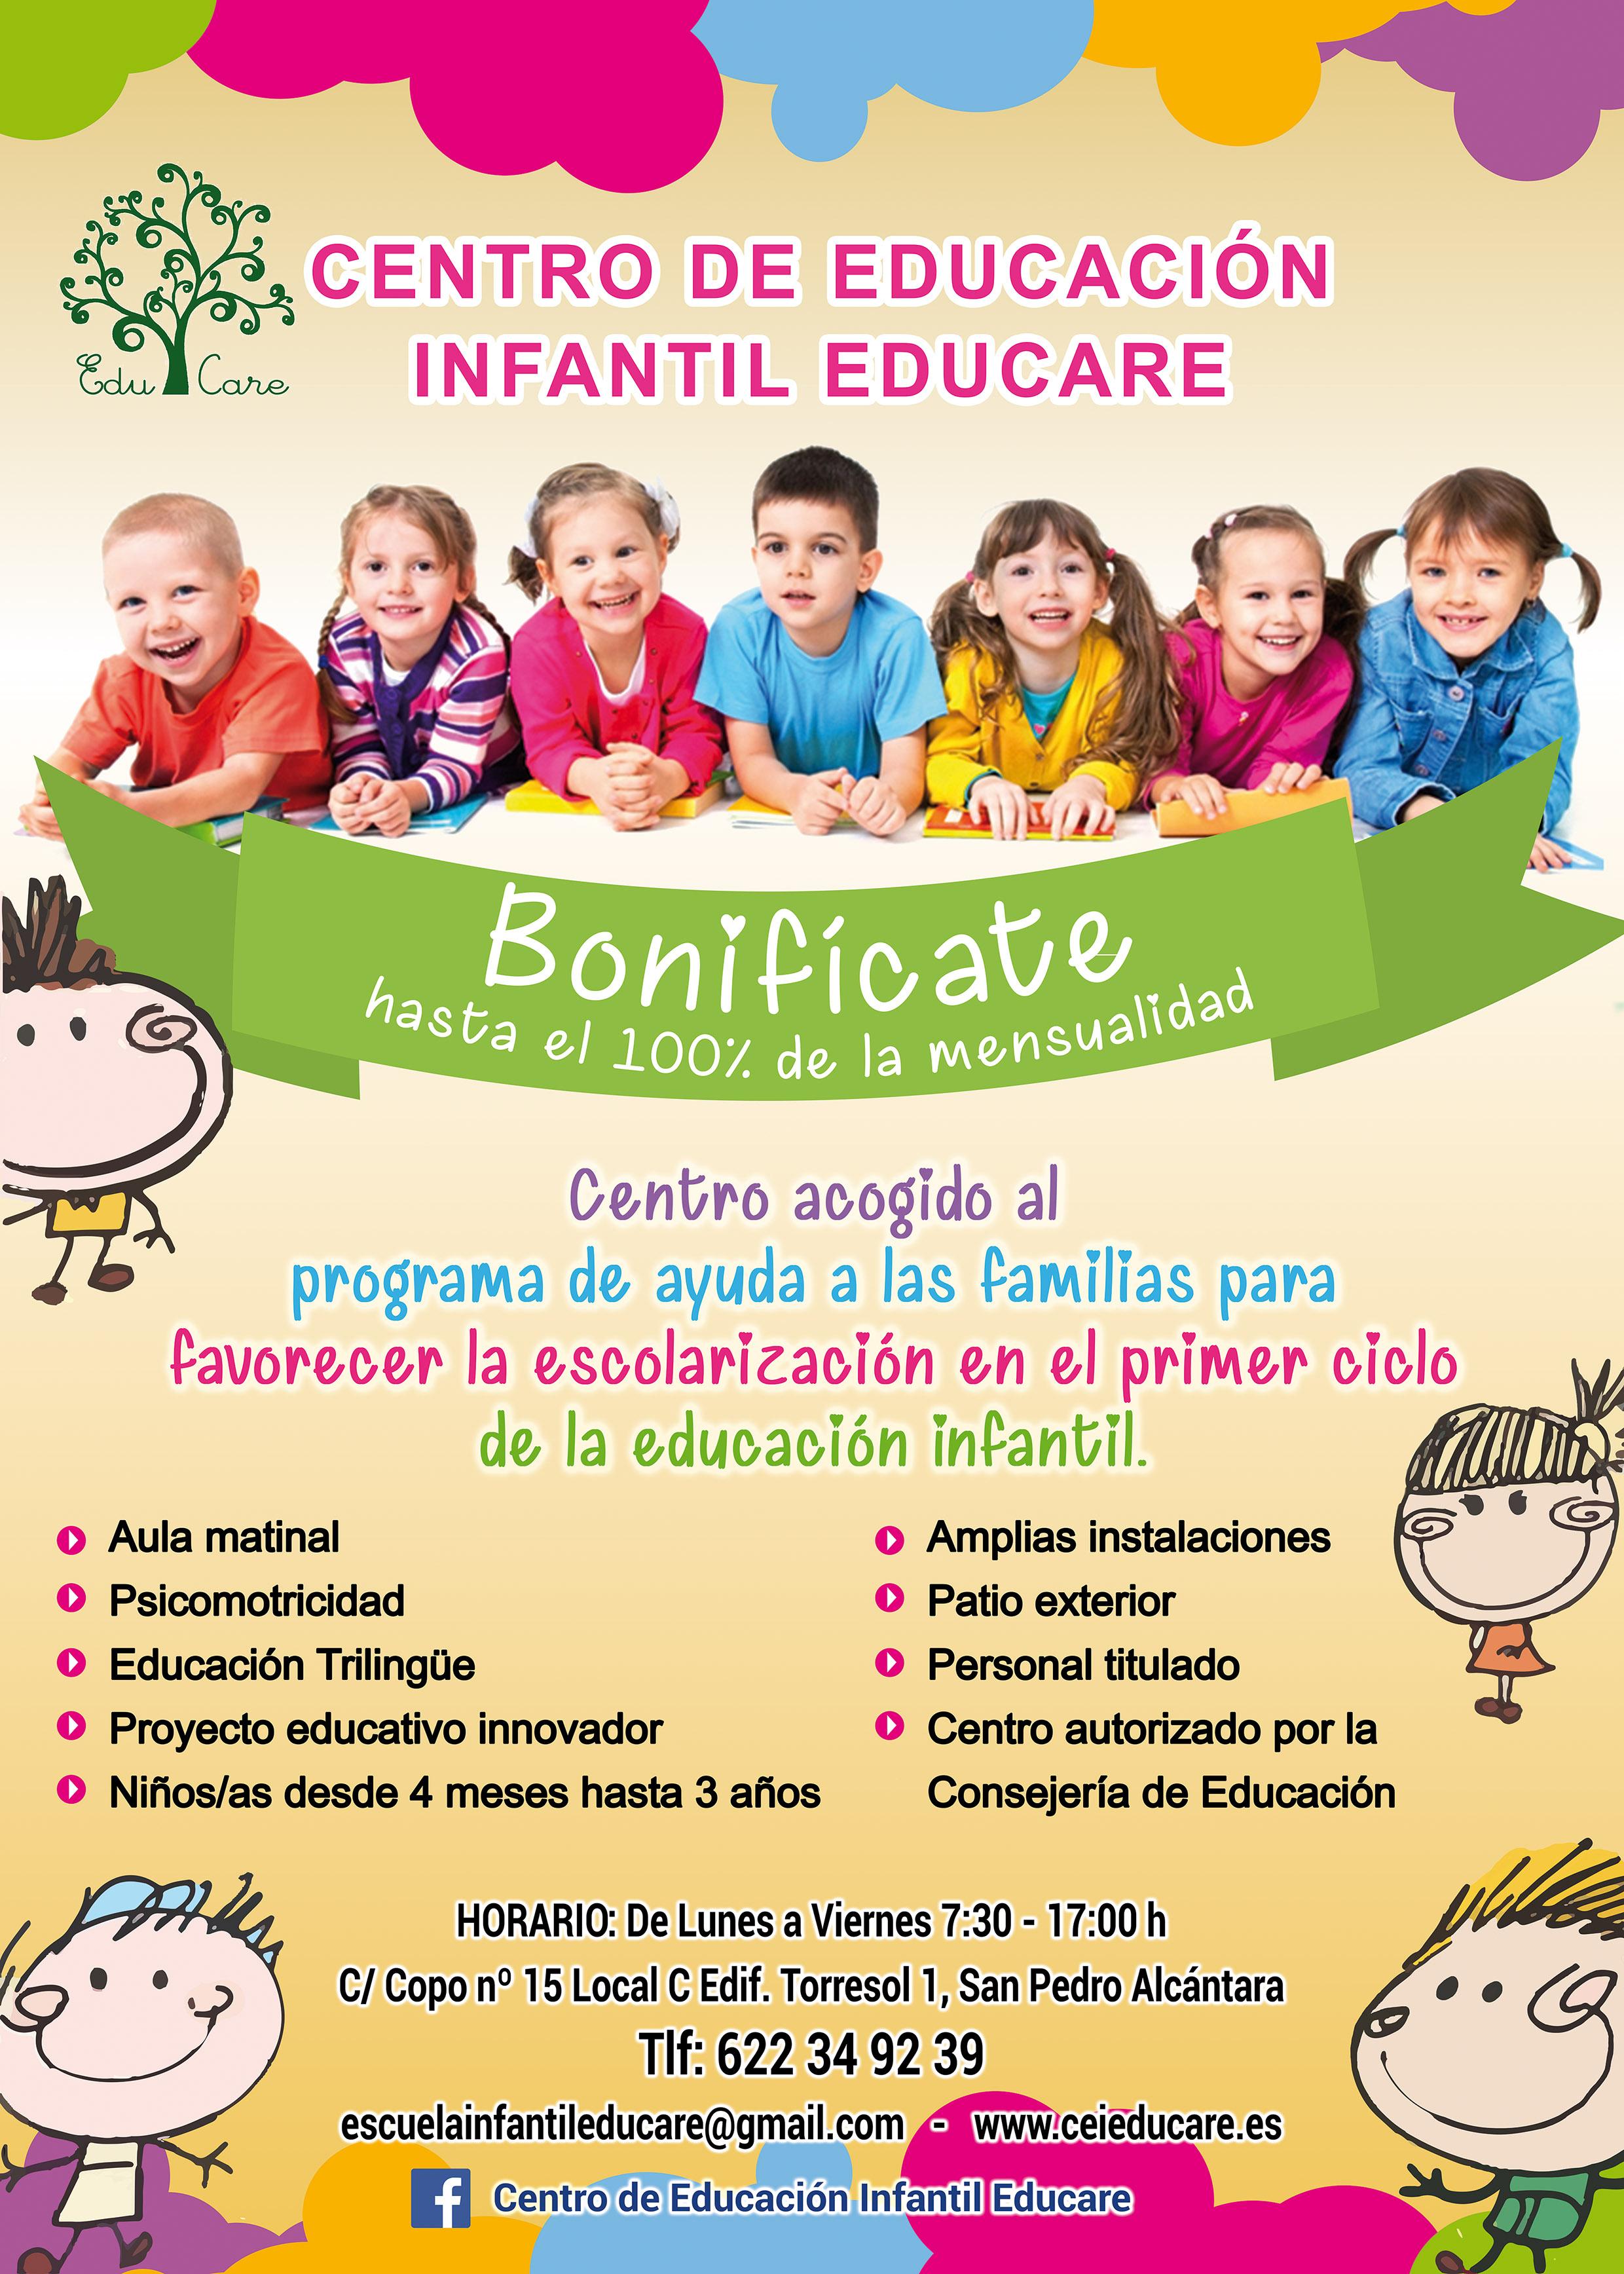 Centro de educación infantil educare